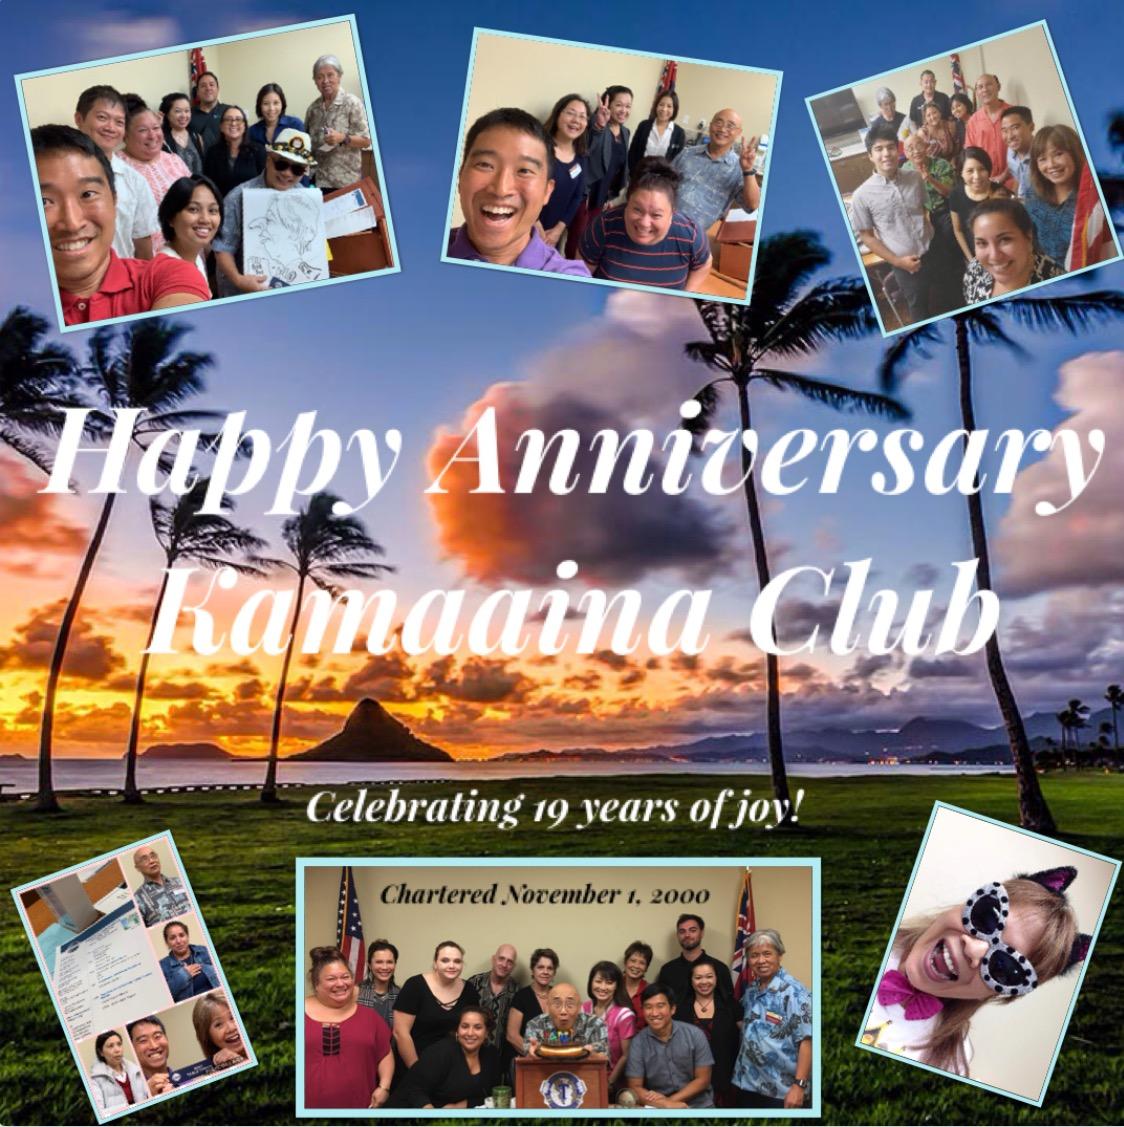 Kamaaina Club Anniversary Flyer